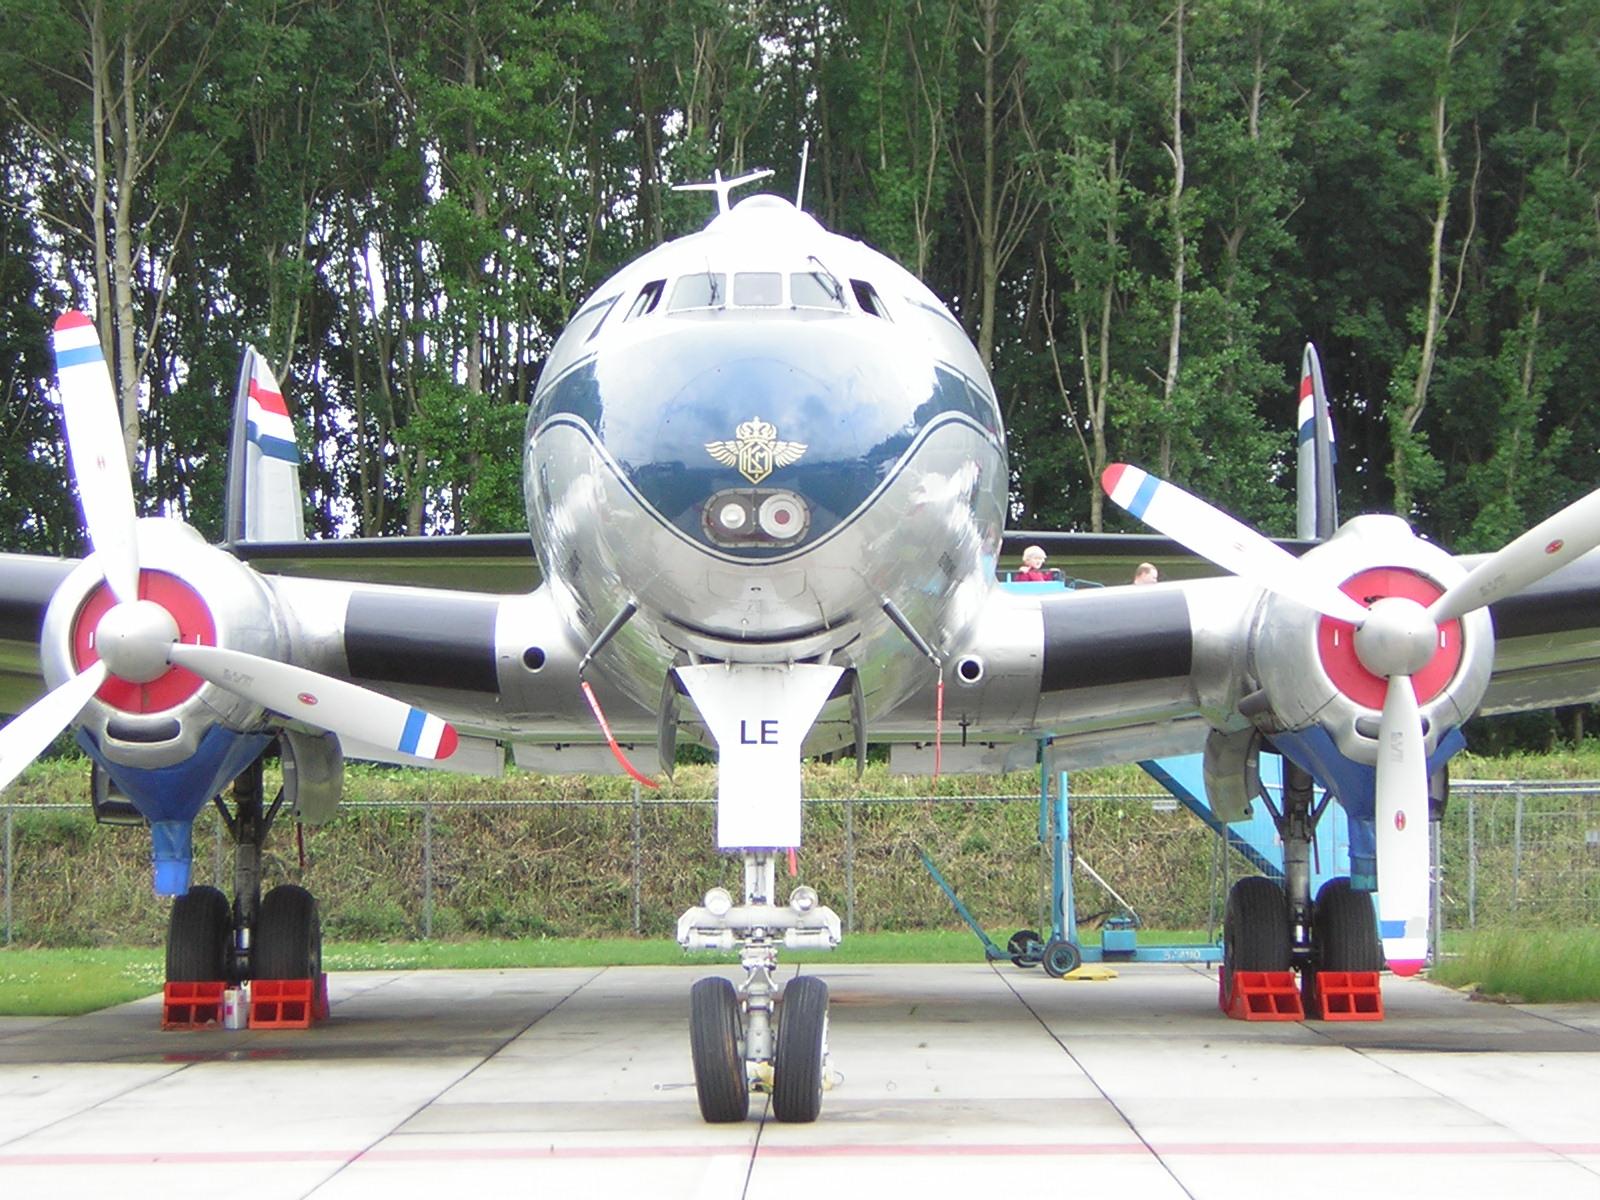 Constellation Aviodrome 2